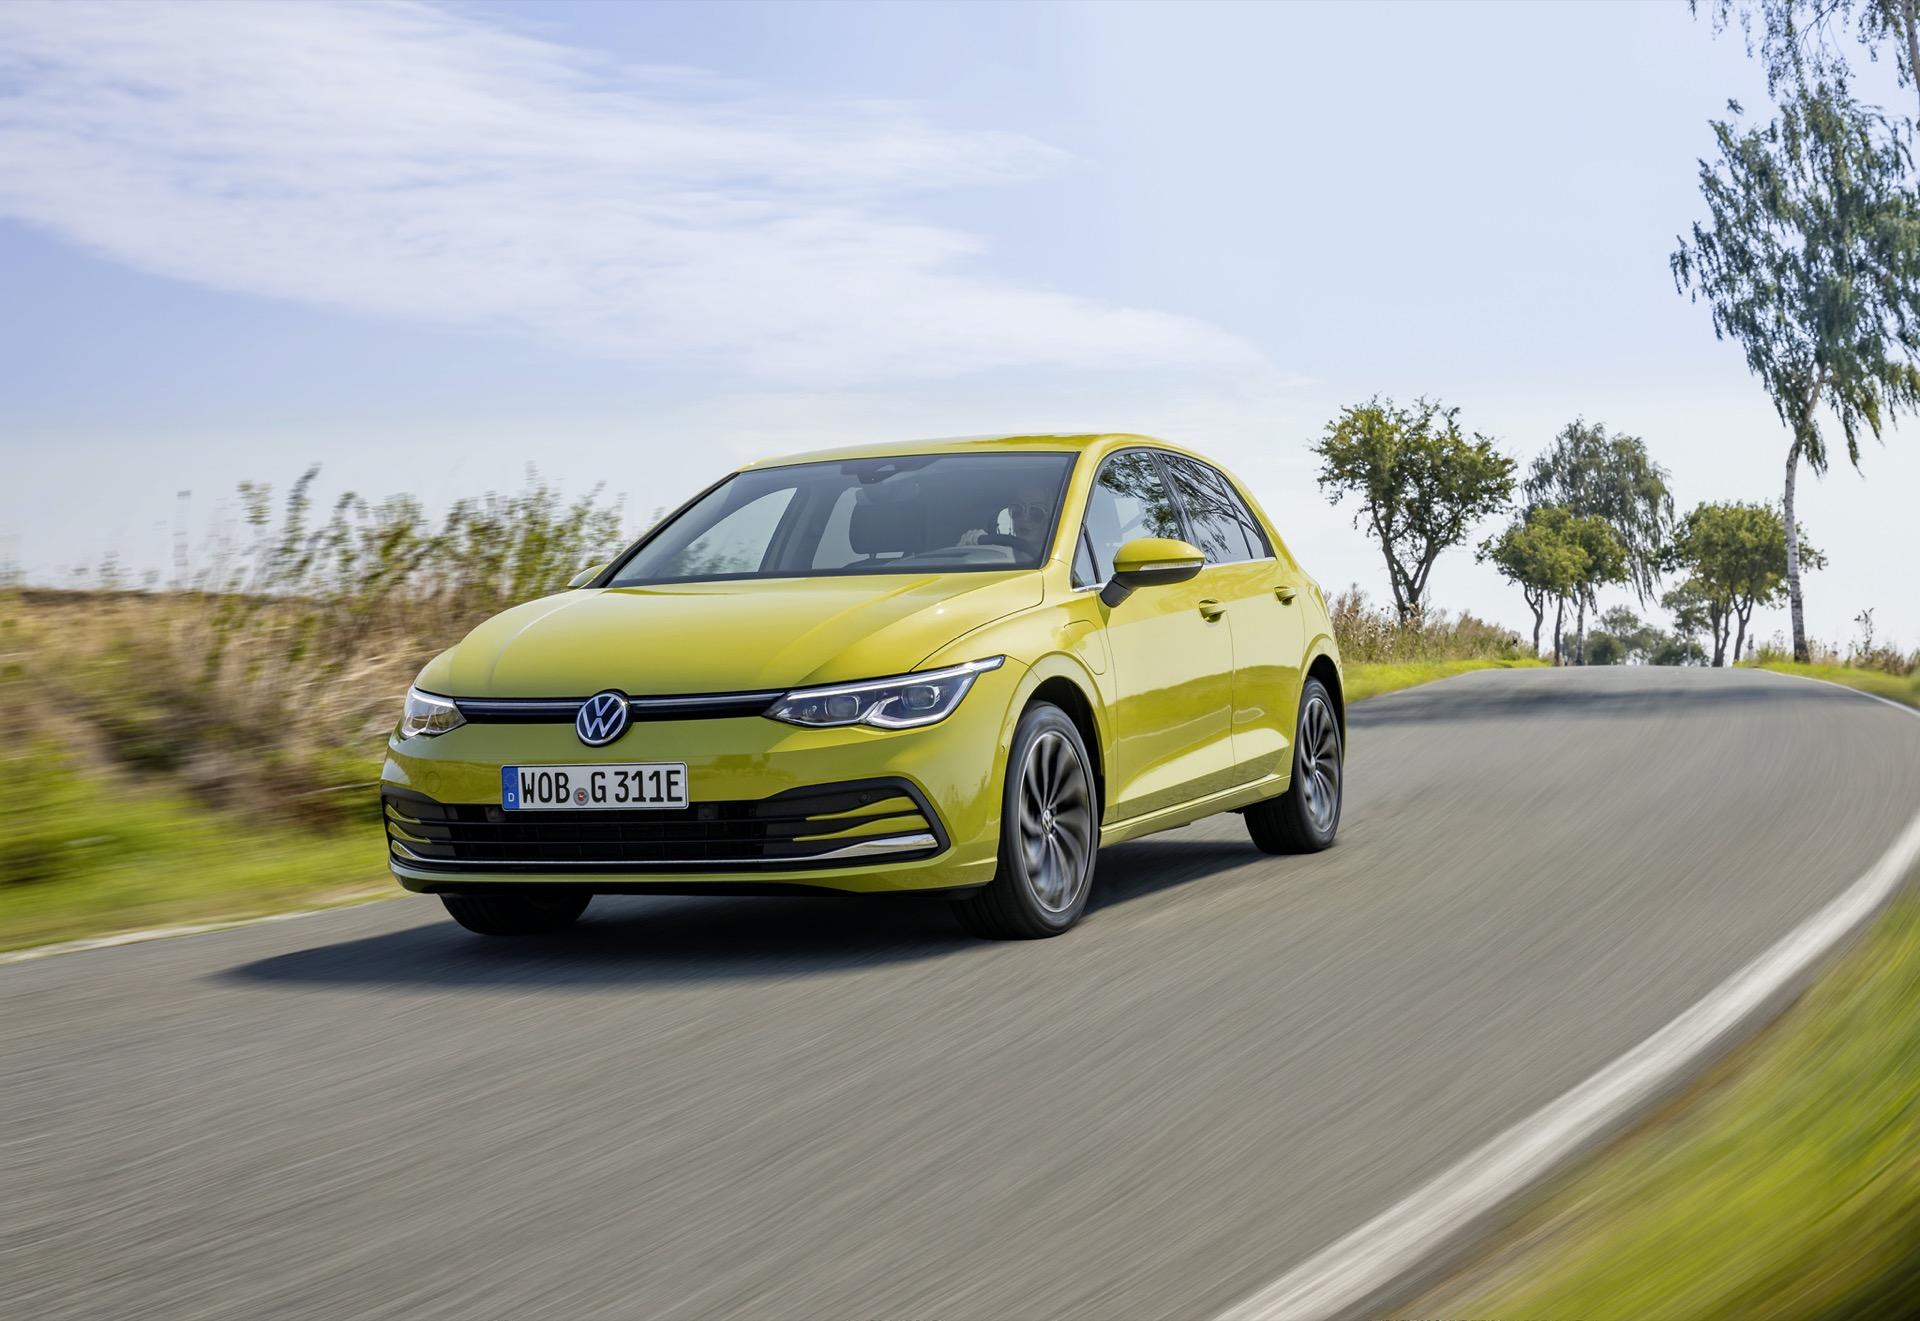 The New Volkswagen Golf Ehybrid